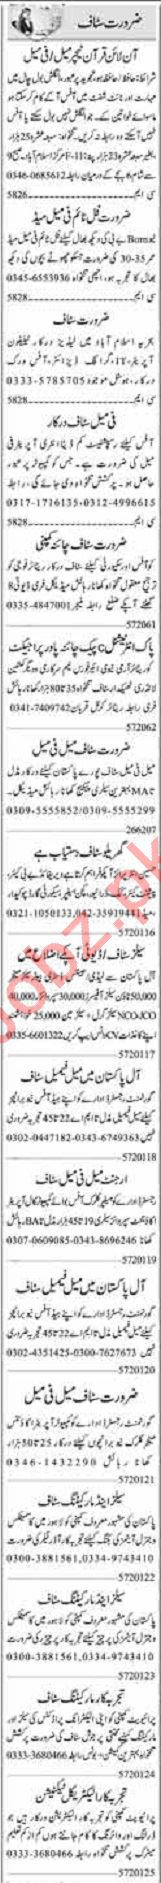 Dunya Sunday Islamabad Classified Ads 5th July 2020